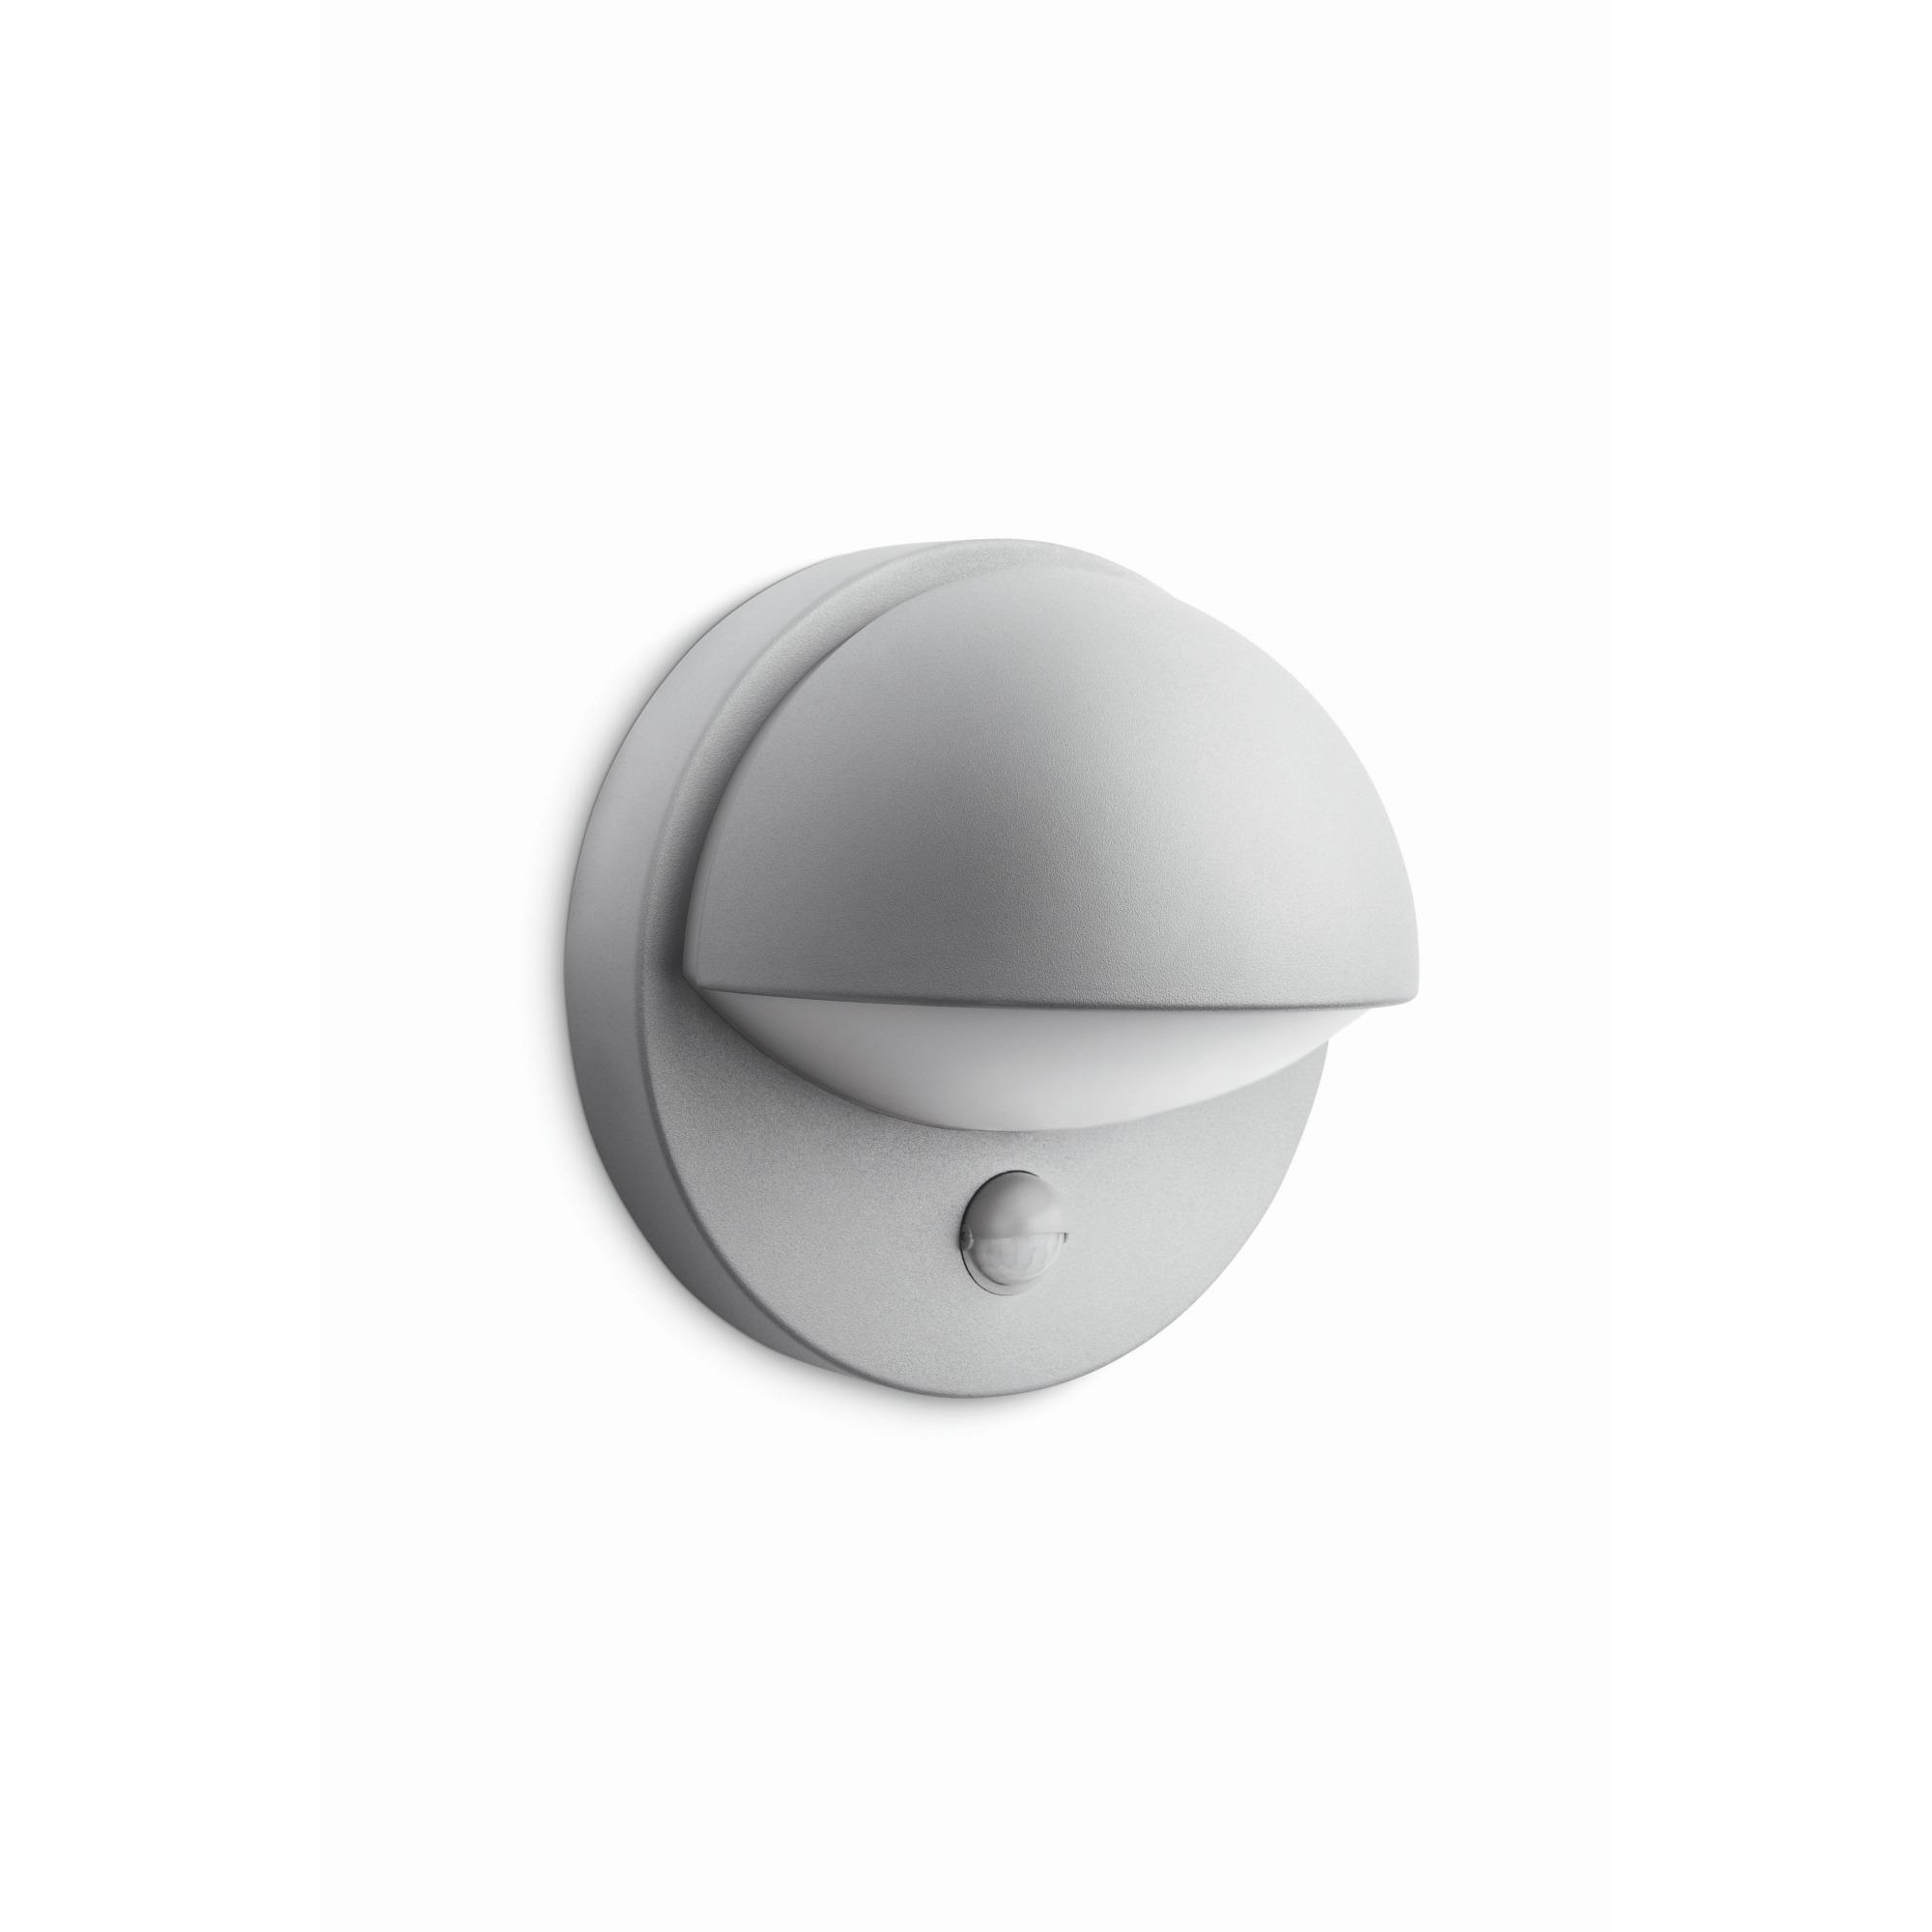 Philips mygarden june wandlamp 230 v 12 w e27 grijs